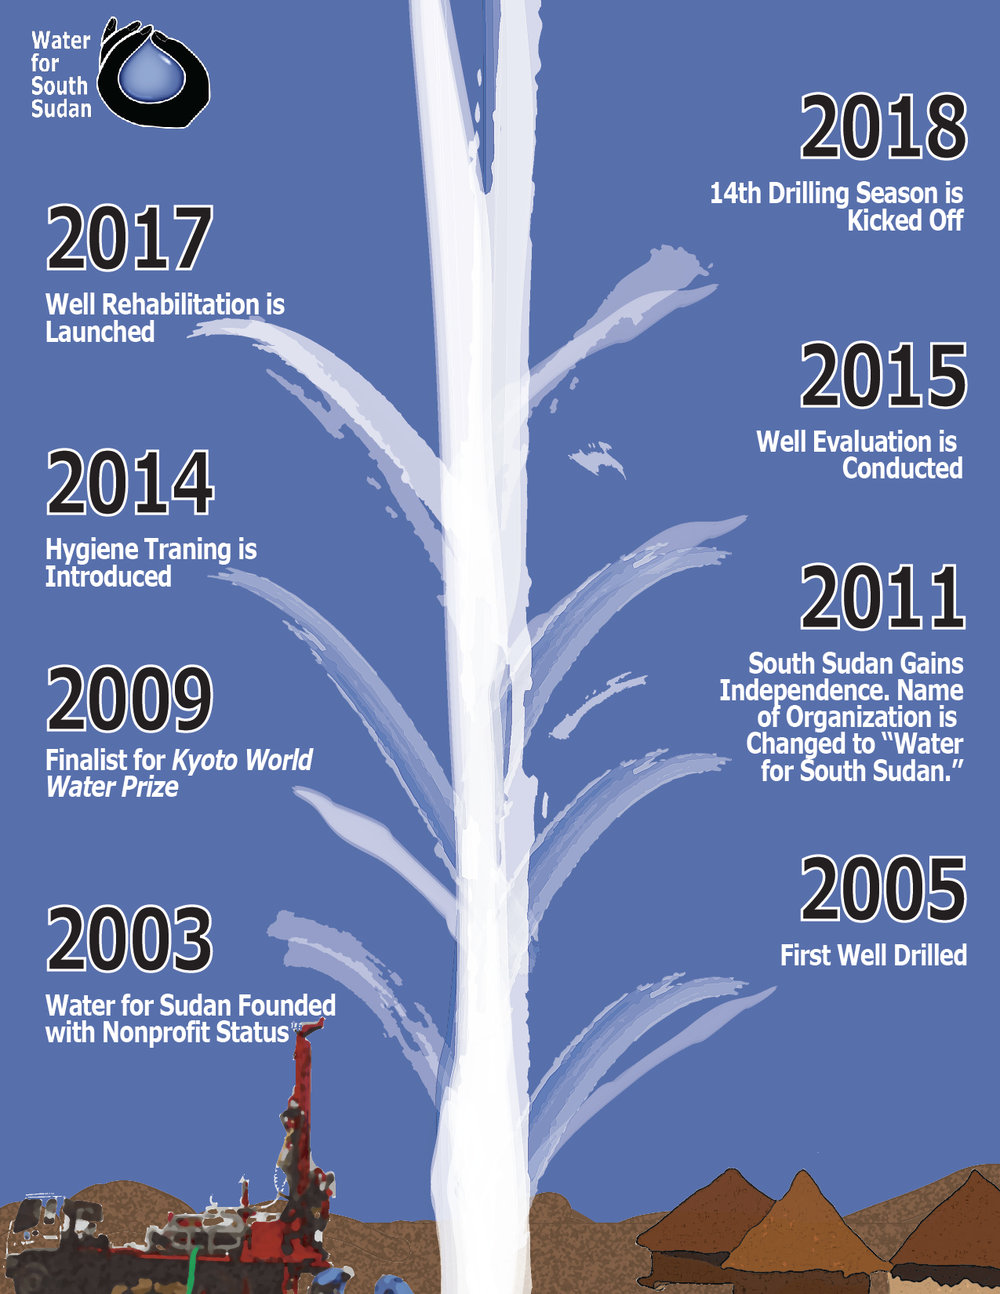 Timeline Infographic_Timeline Graphic.jpg